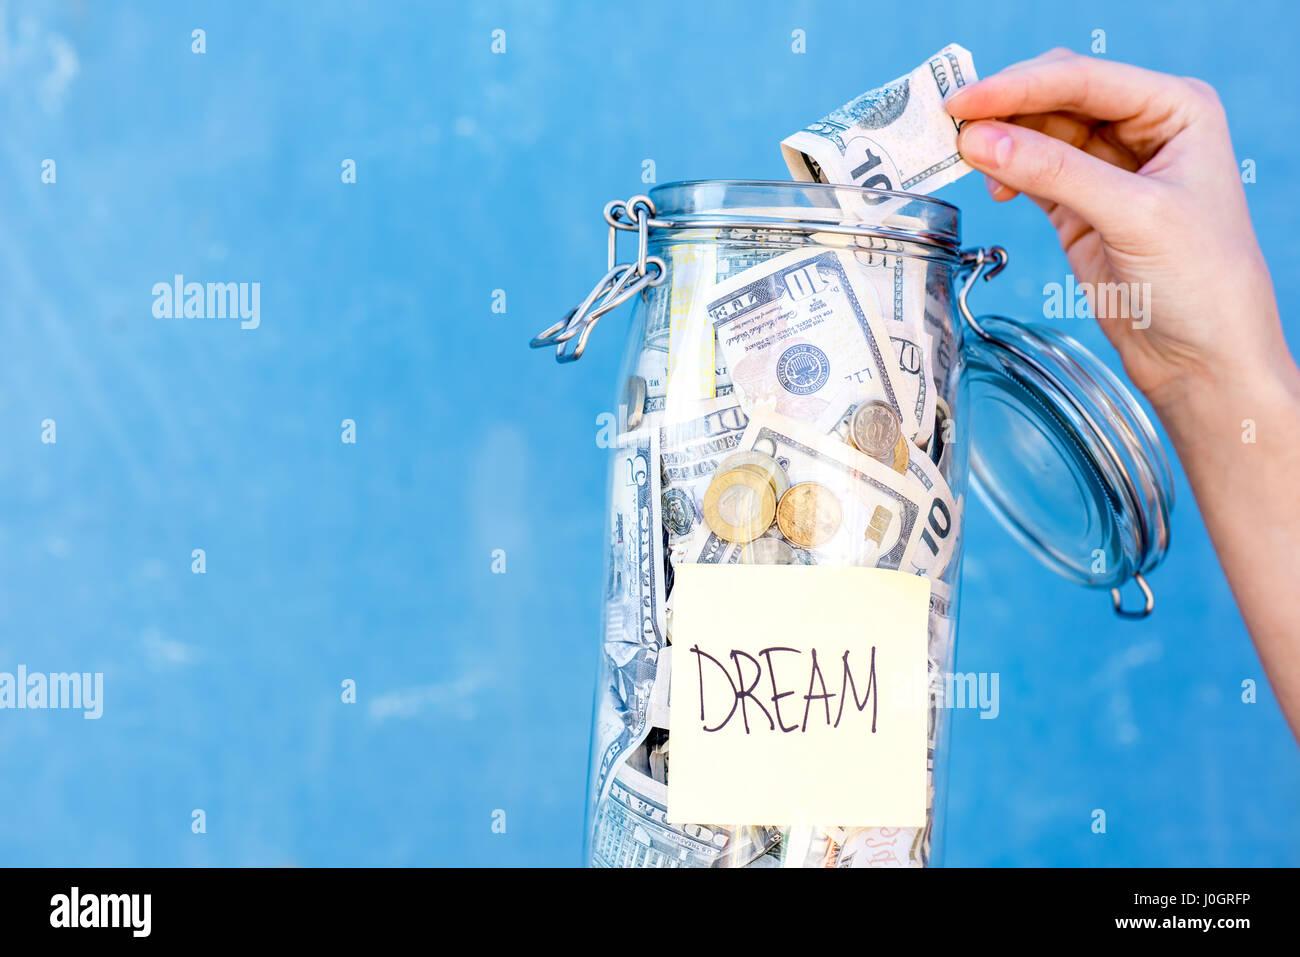 Why dream of saving 11